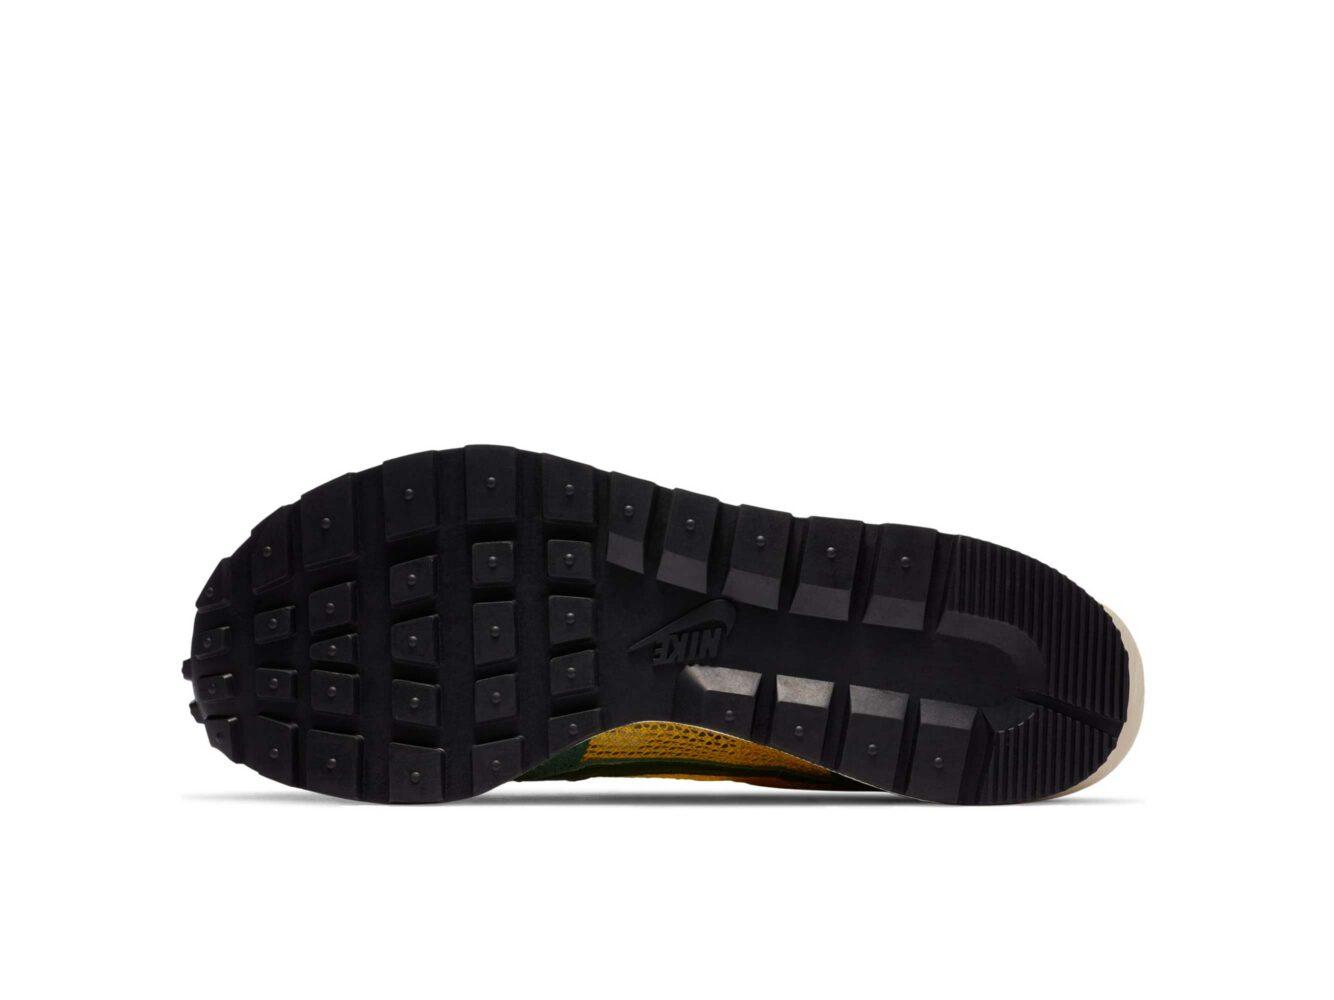 nike x sacai vaporwaffle yellow green CV1363_700 купить